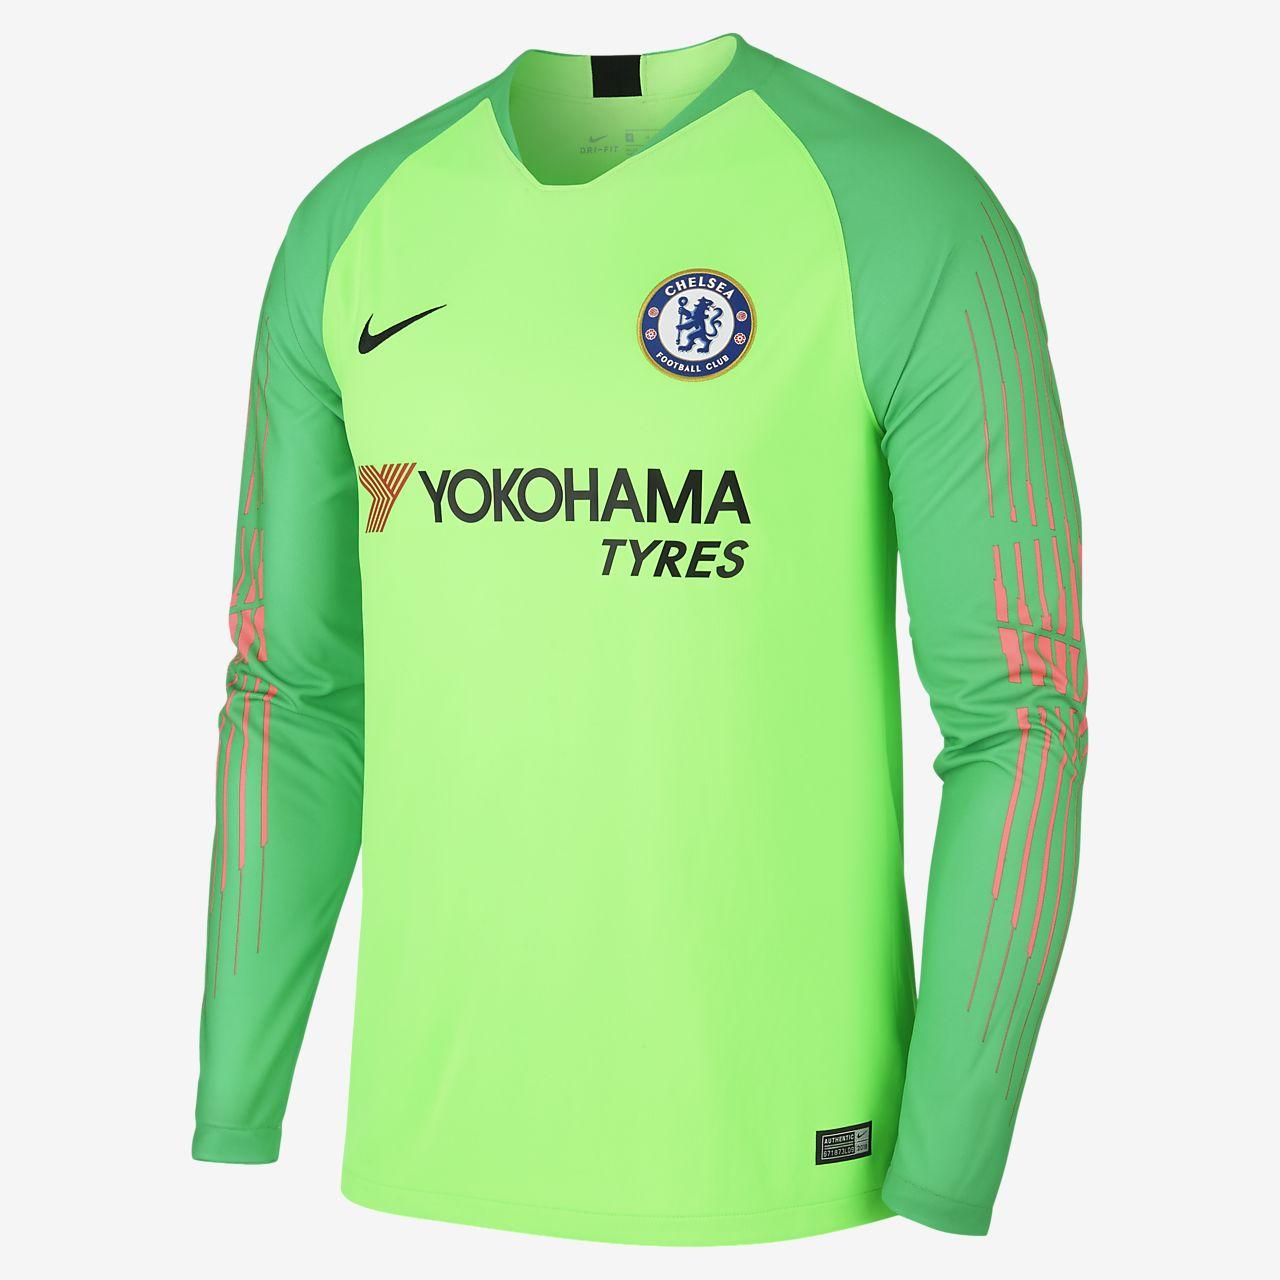 Maglia da calcio a manica lunga 2018/19 Chelsea FC Stadium Goalkeeper - Uomo